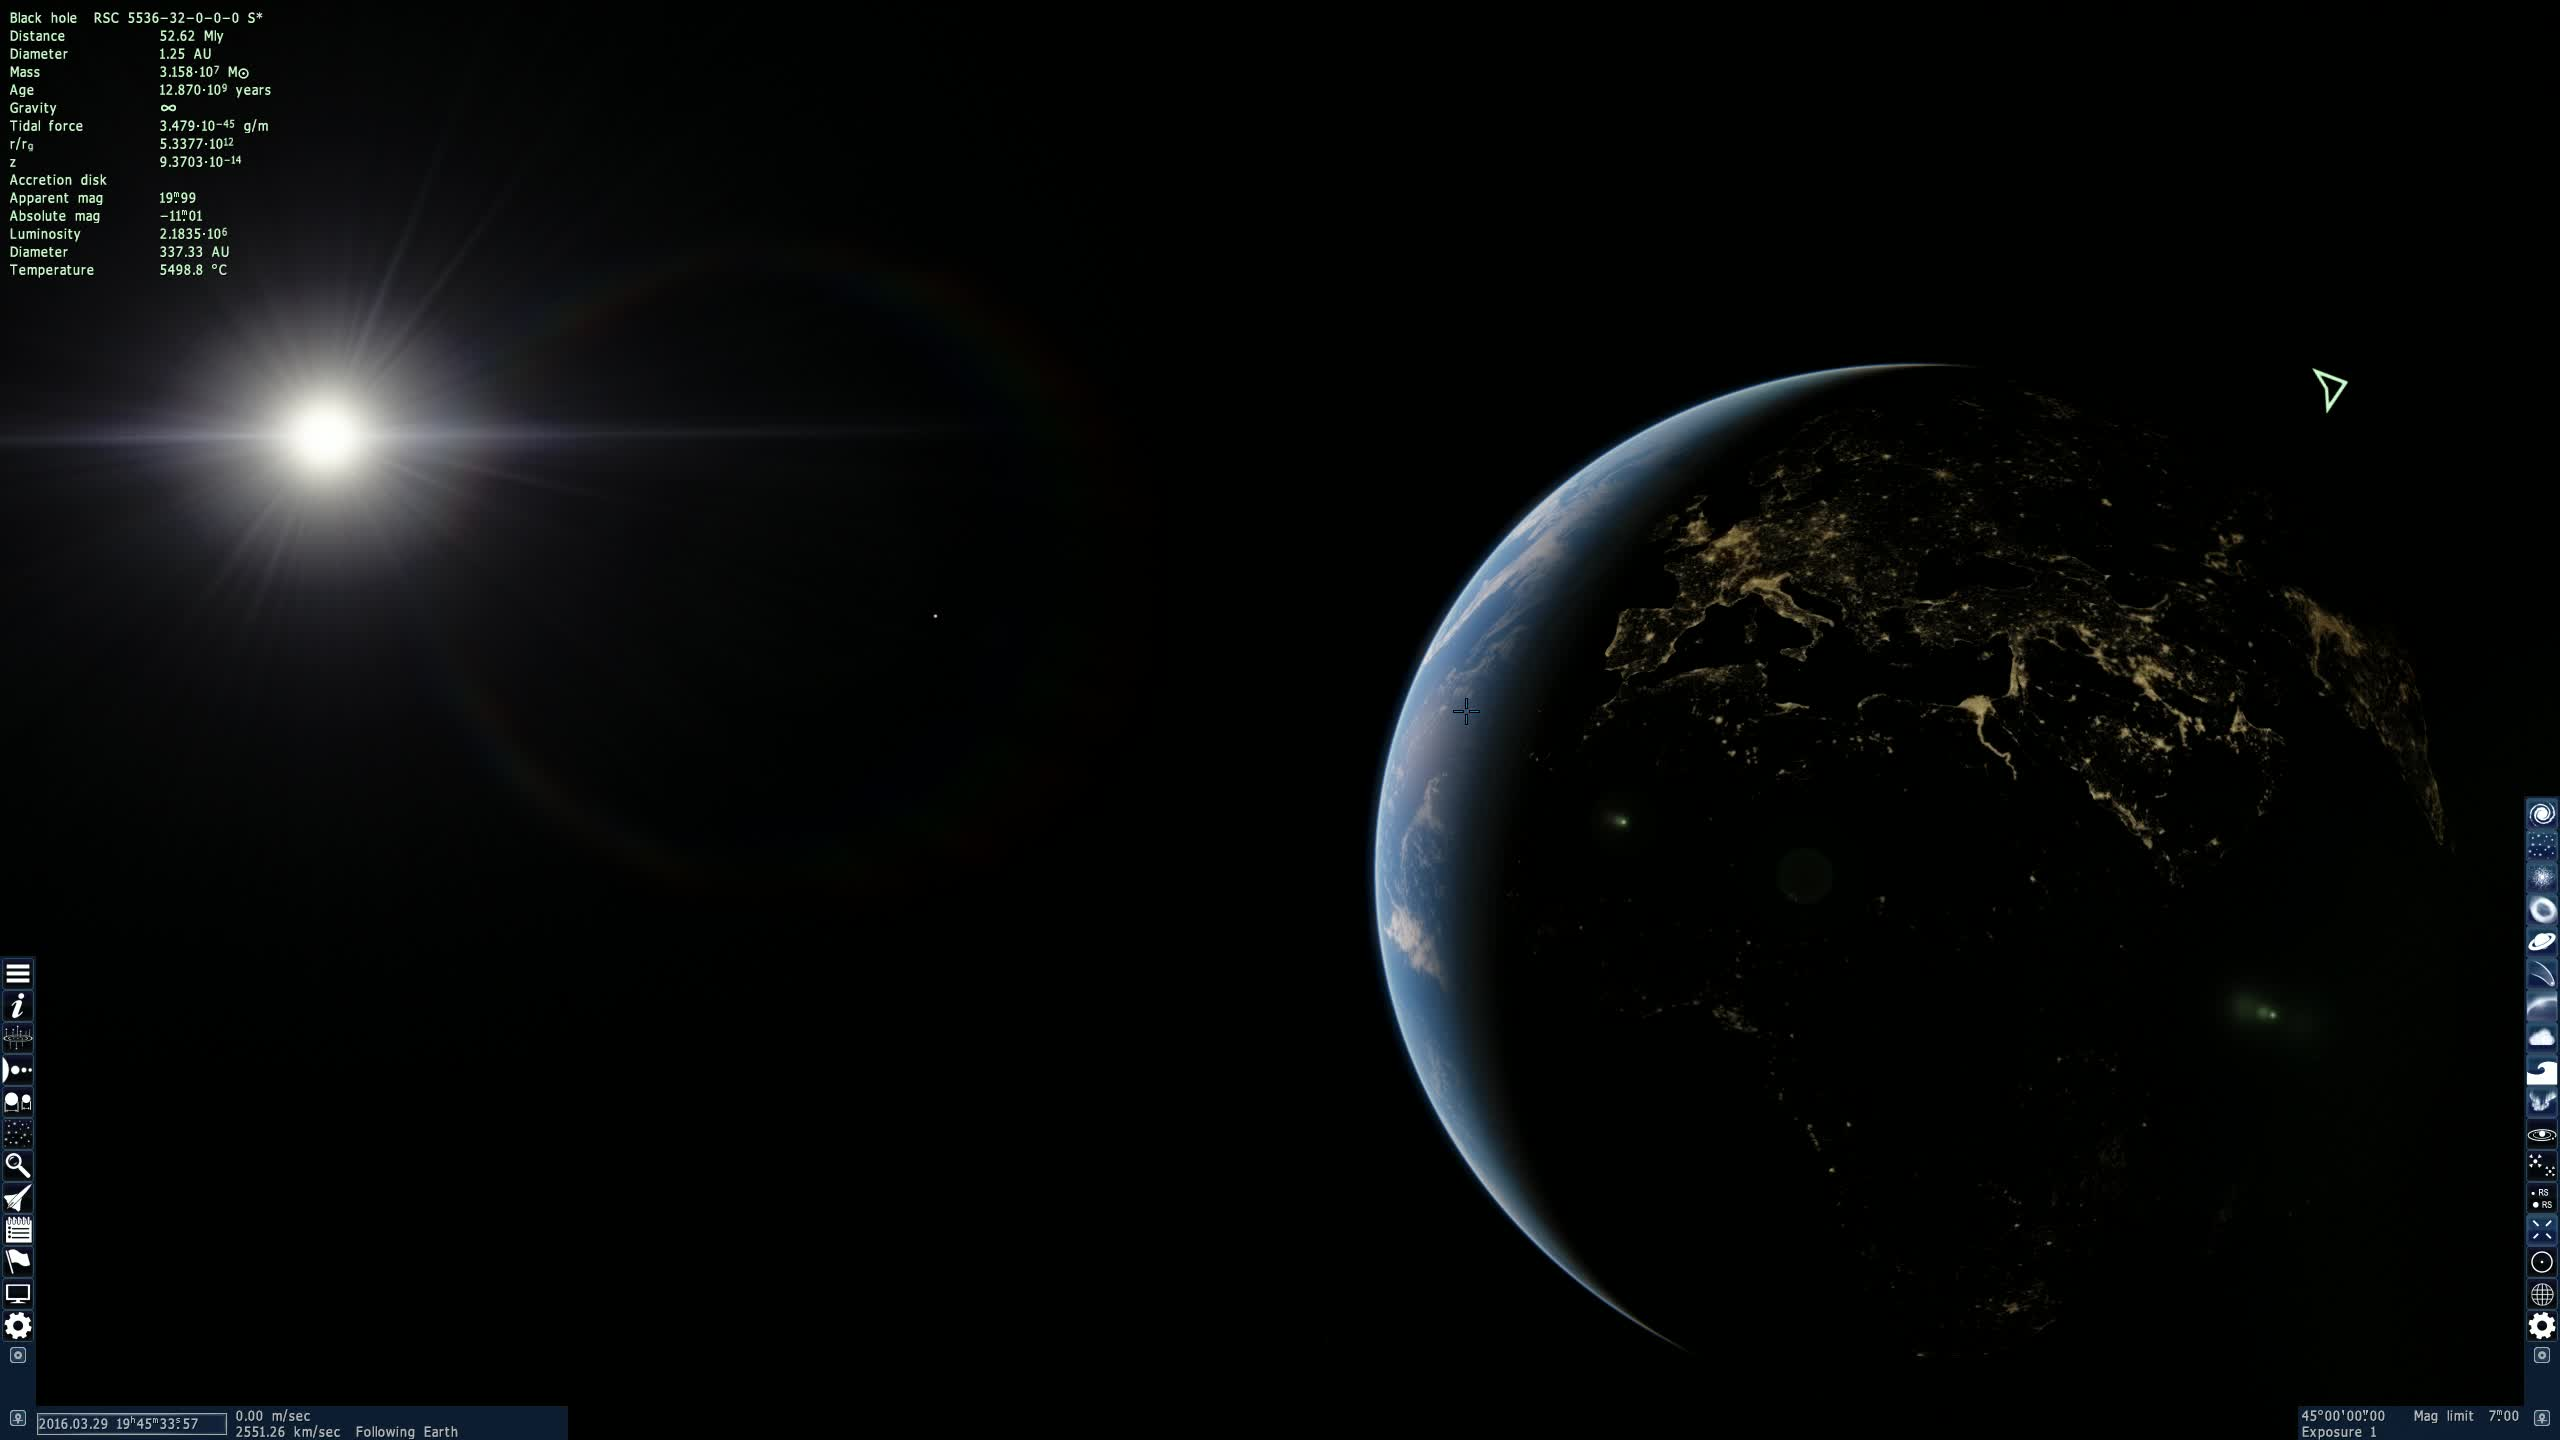 spaceengine, SPACE ENGINE 2019.04.12 - 11.00.34.05 GIFs